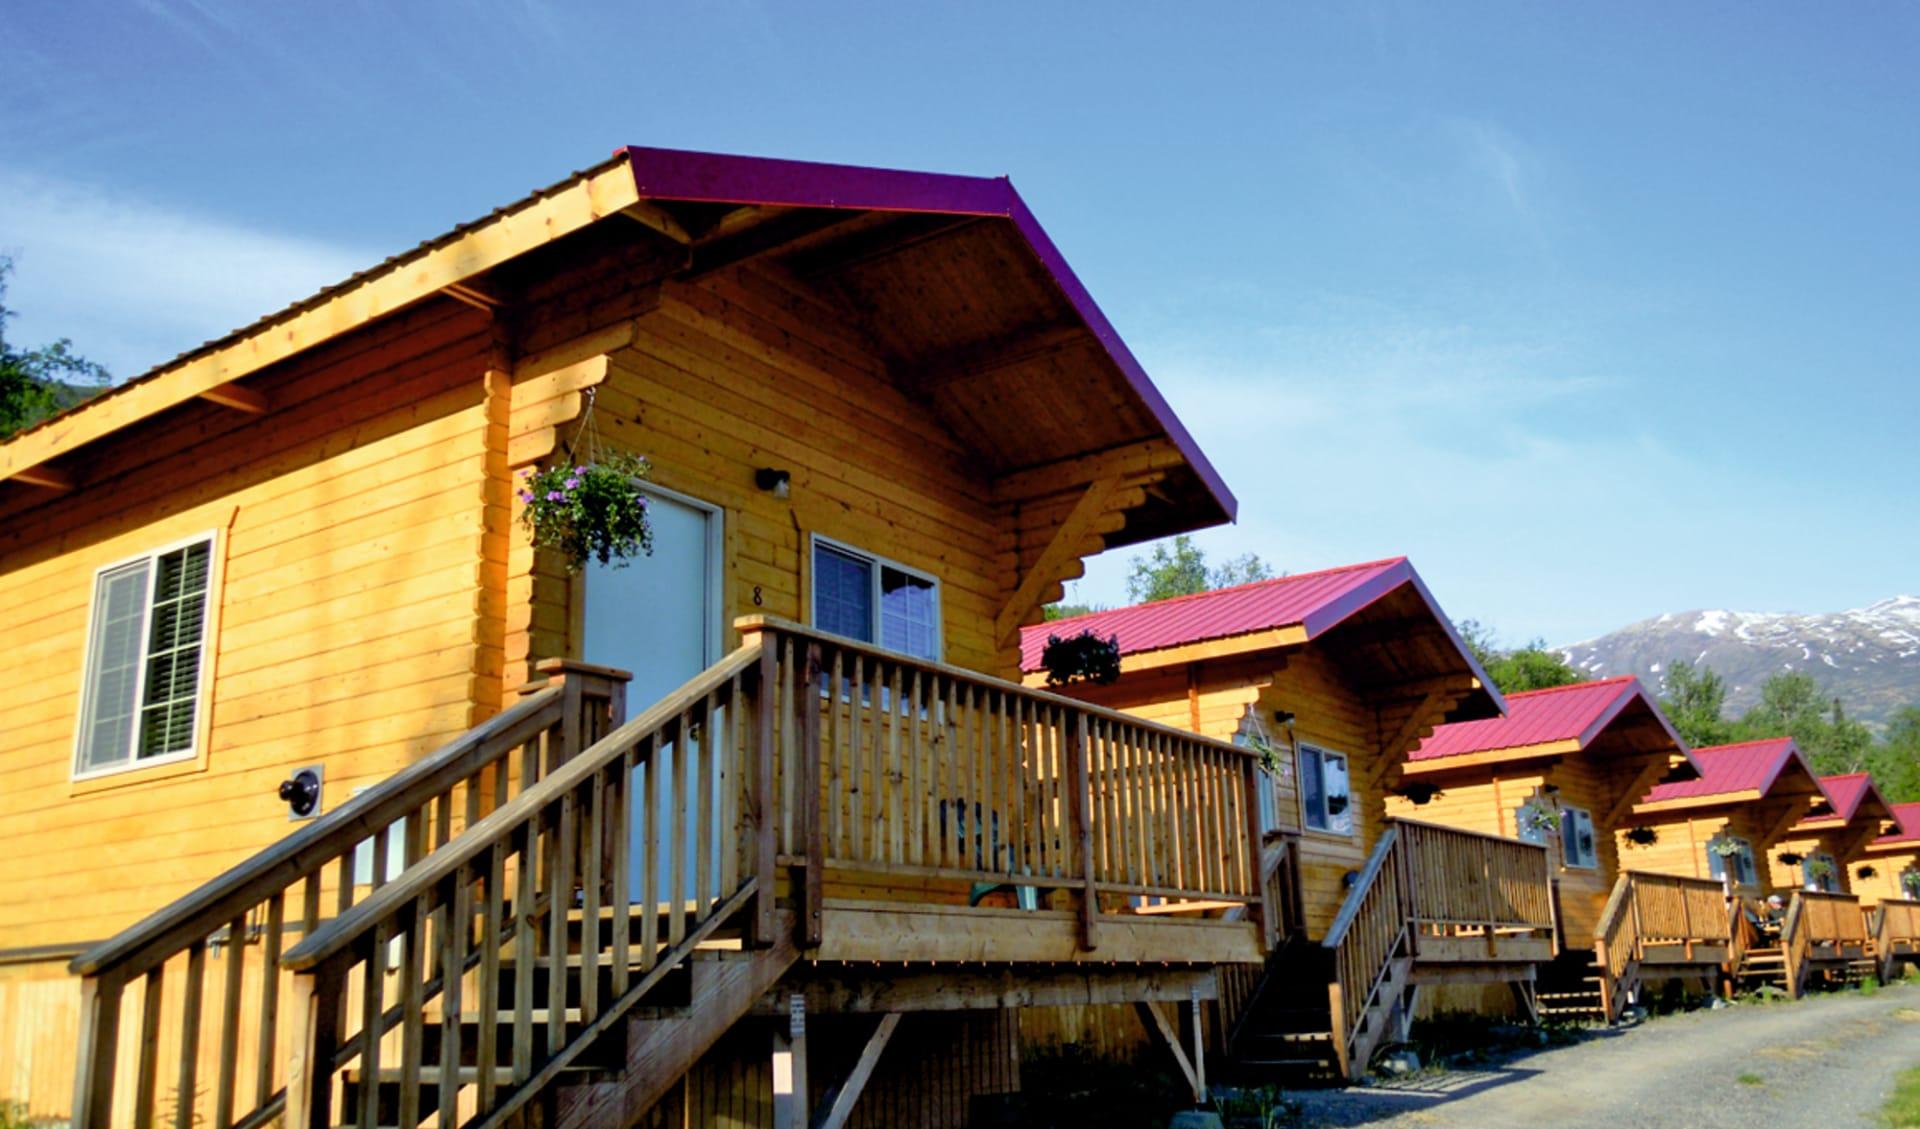 Knik River Lodge:  Knik River Lodge - Wohnhäuser Aussenansicht